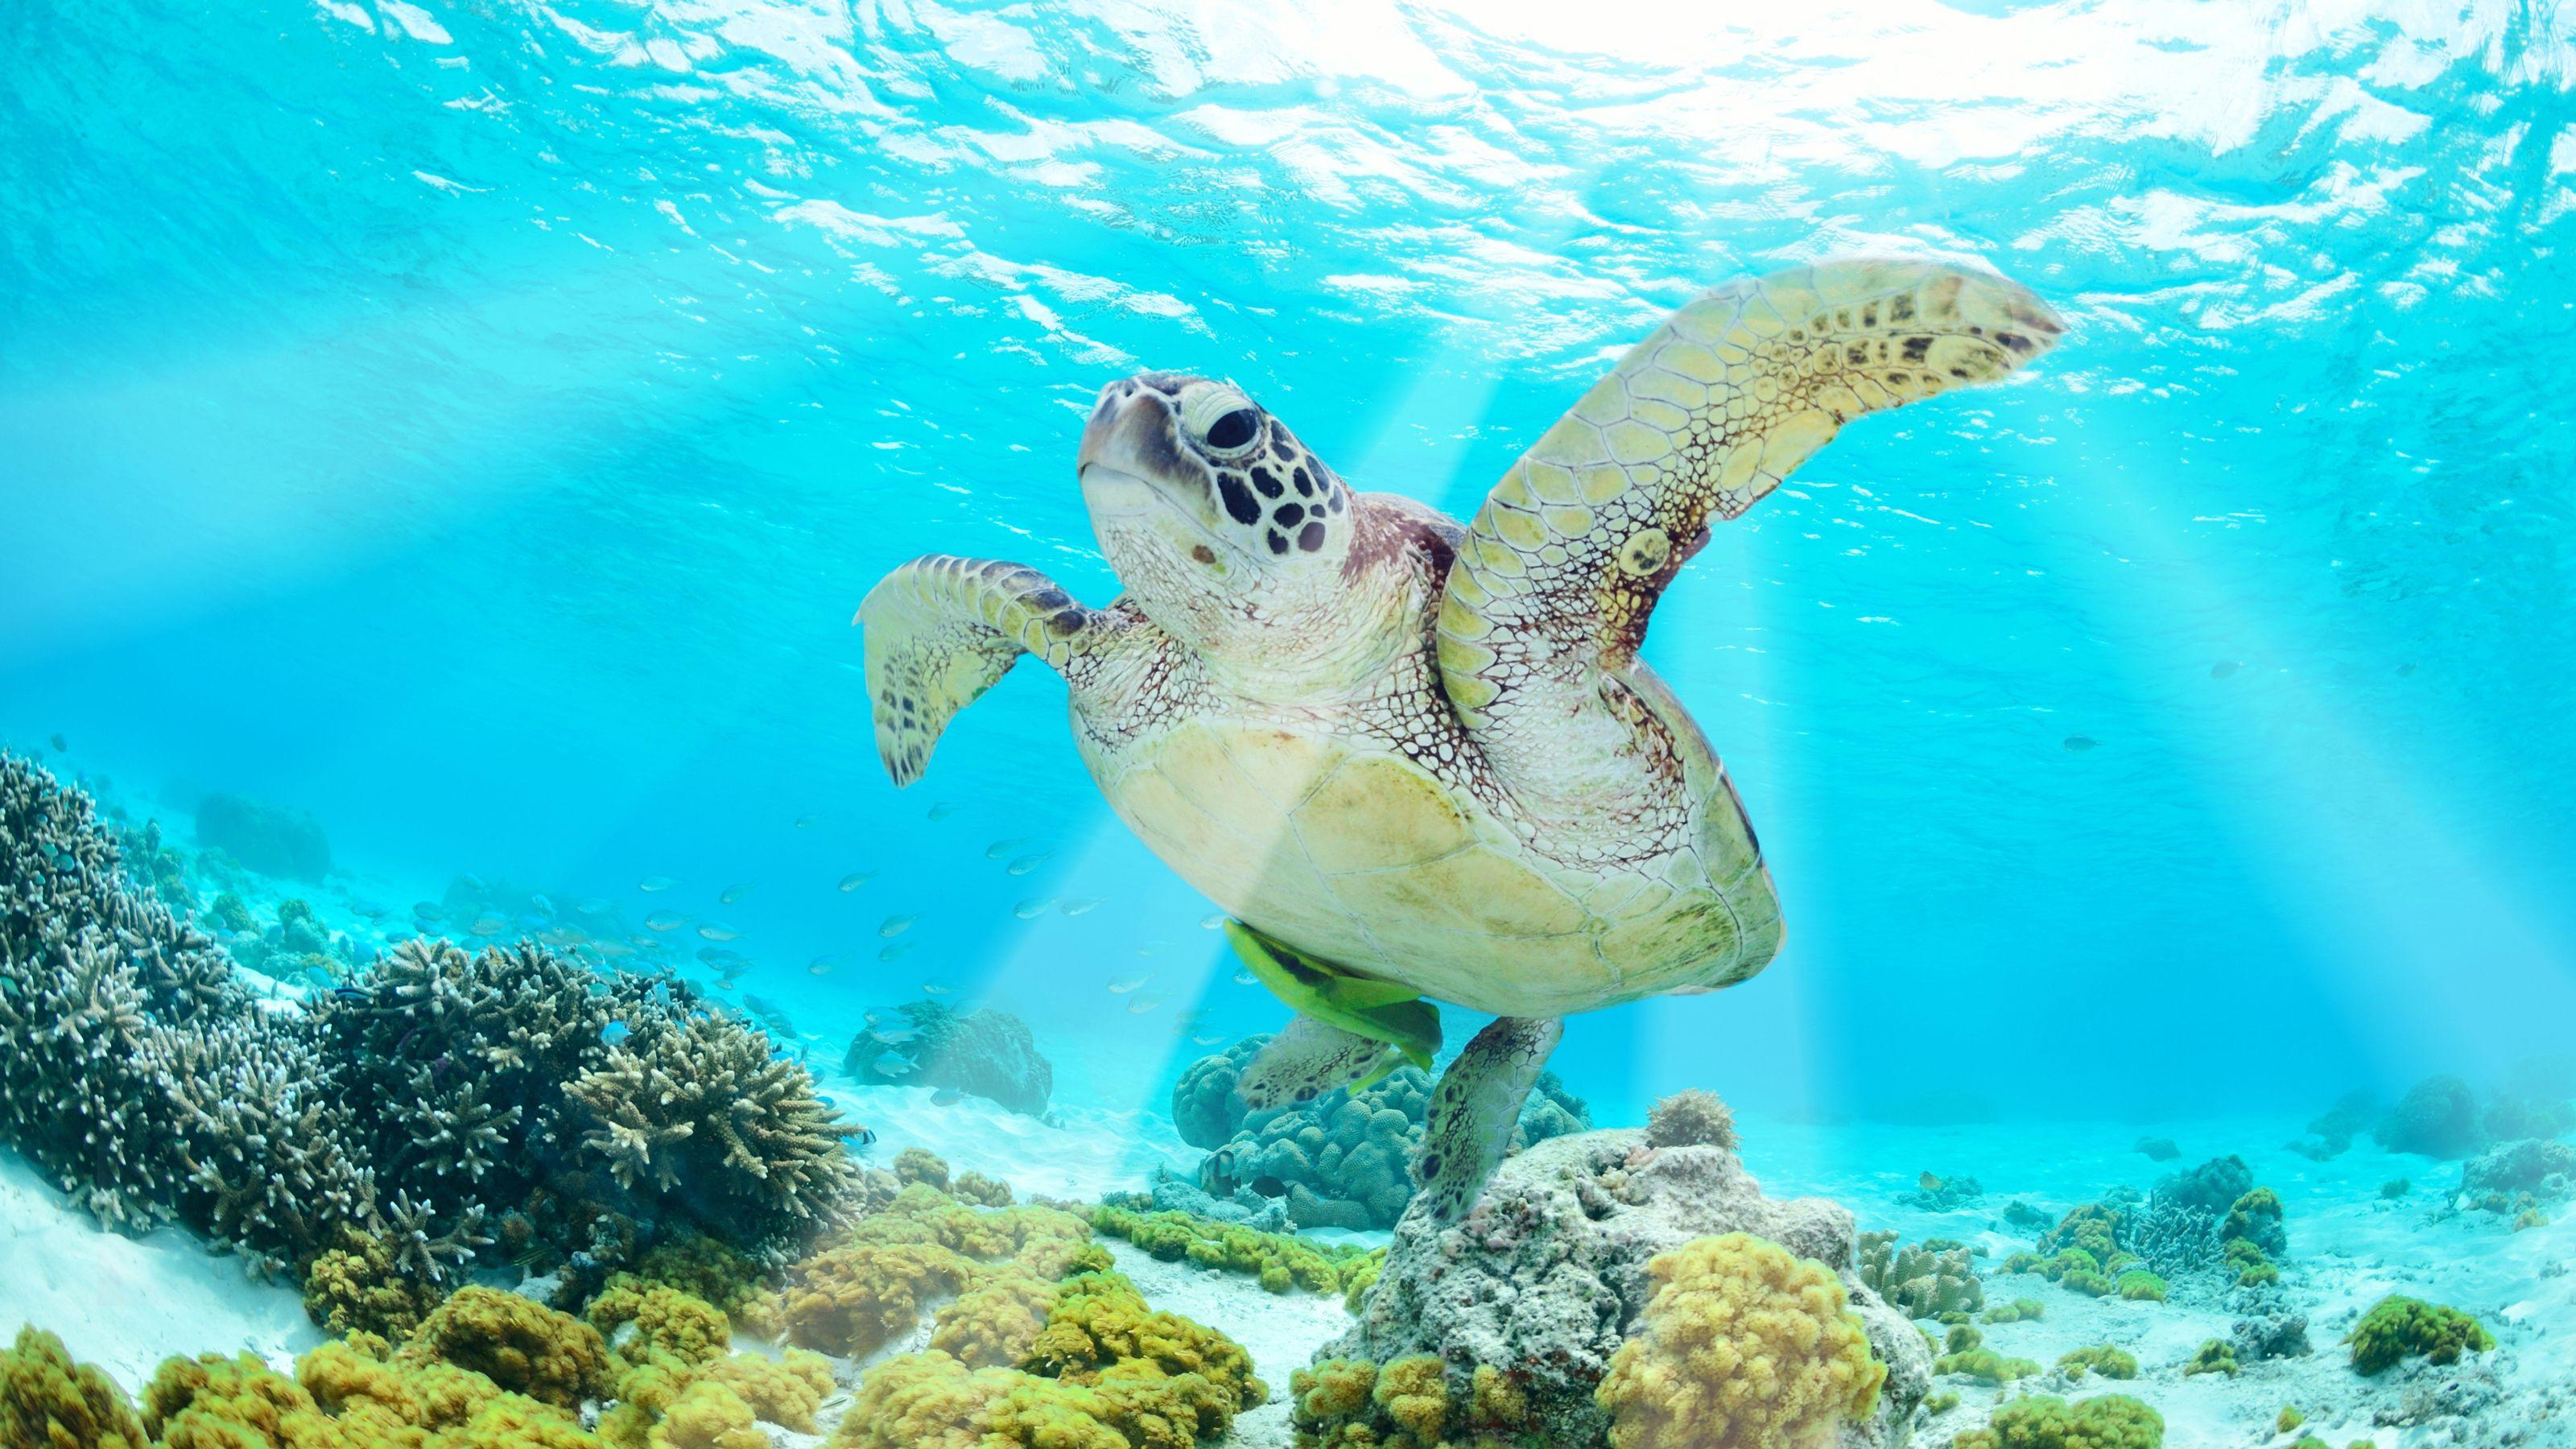 Sea turtle at Xcaret Park in Riviera Maya